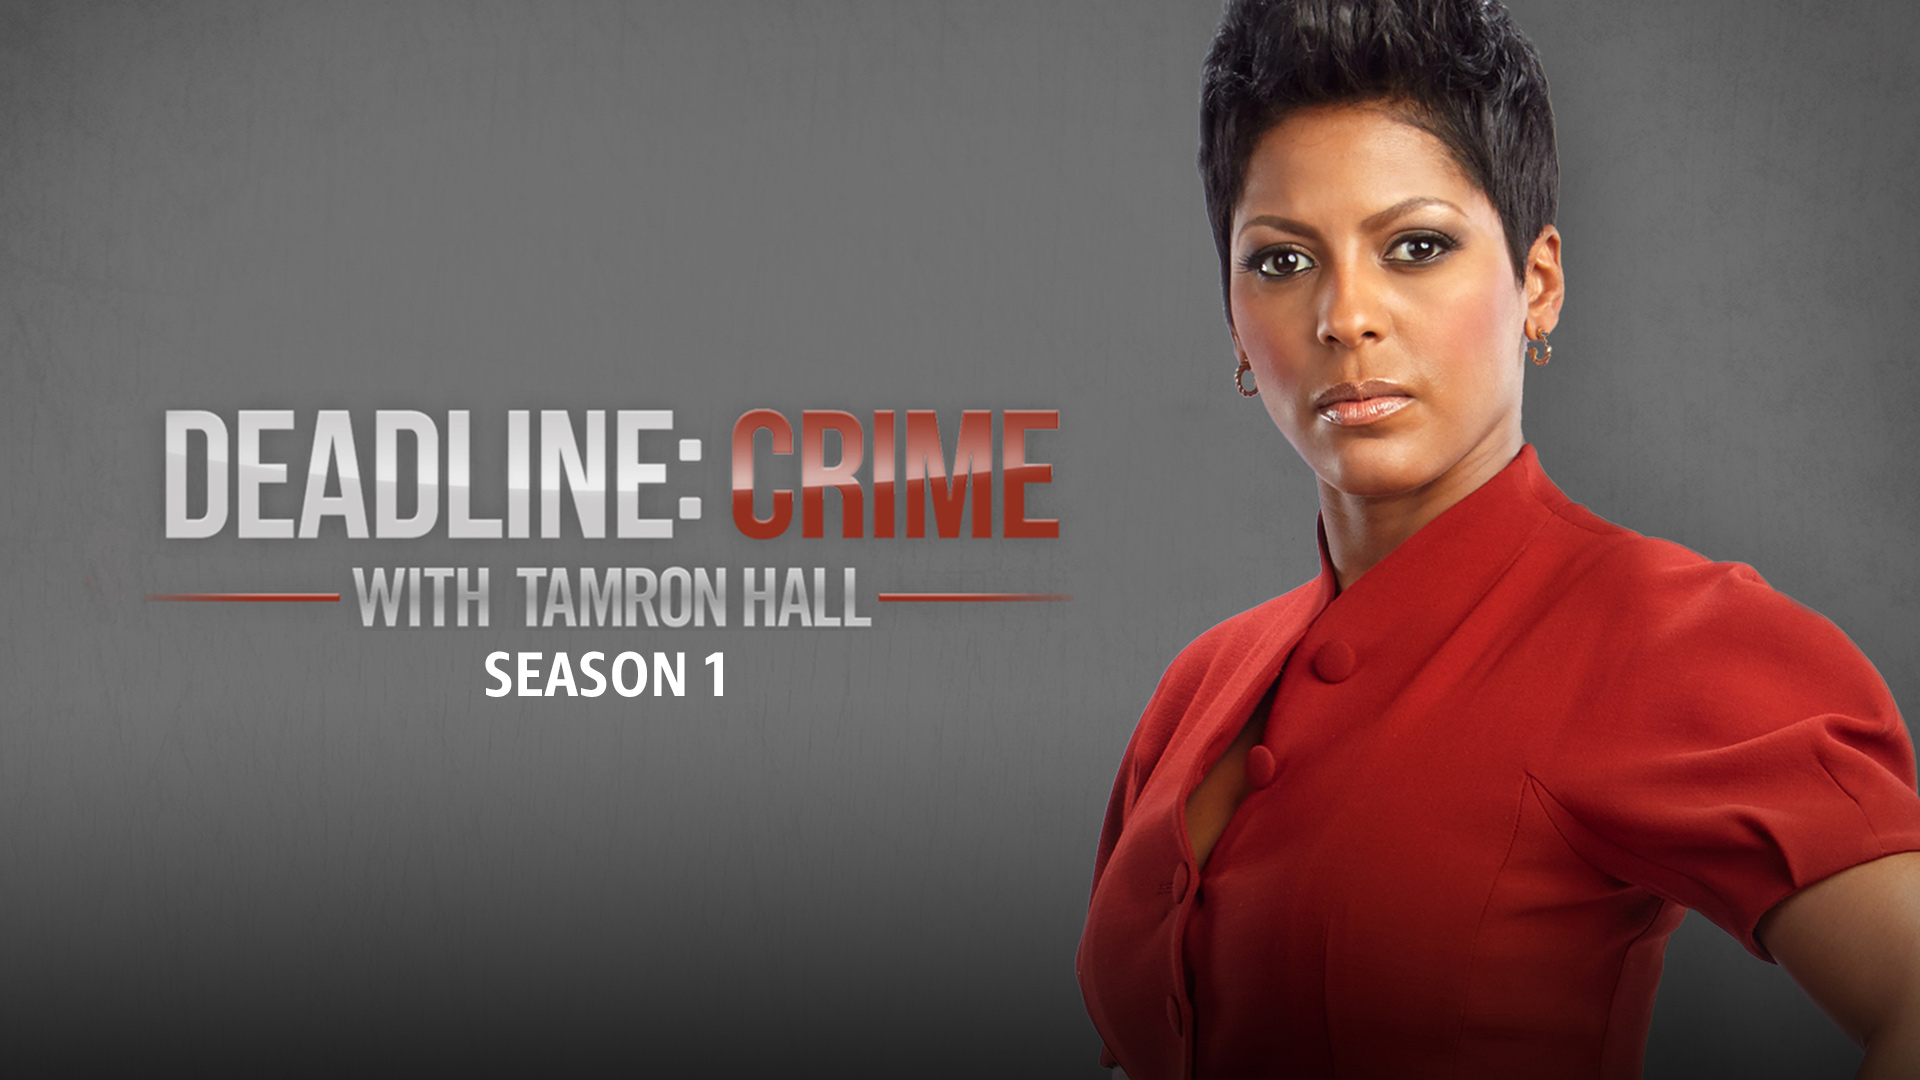 Deadline: Crime with Tamron Hall - Season 1